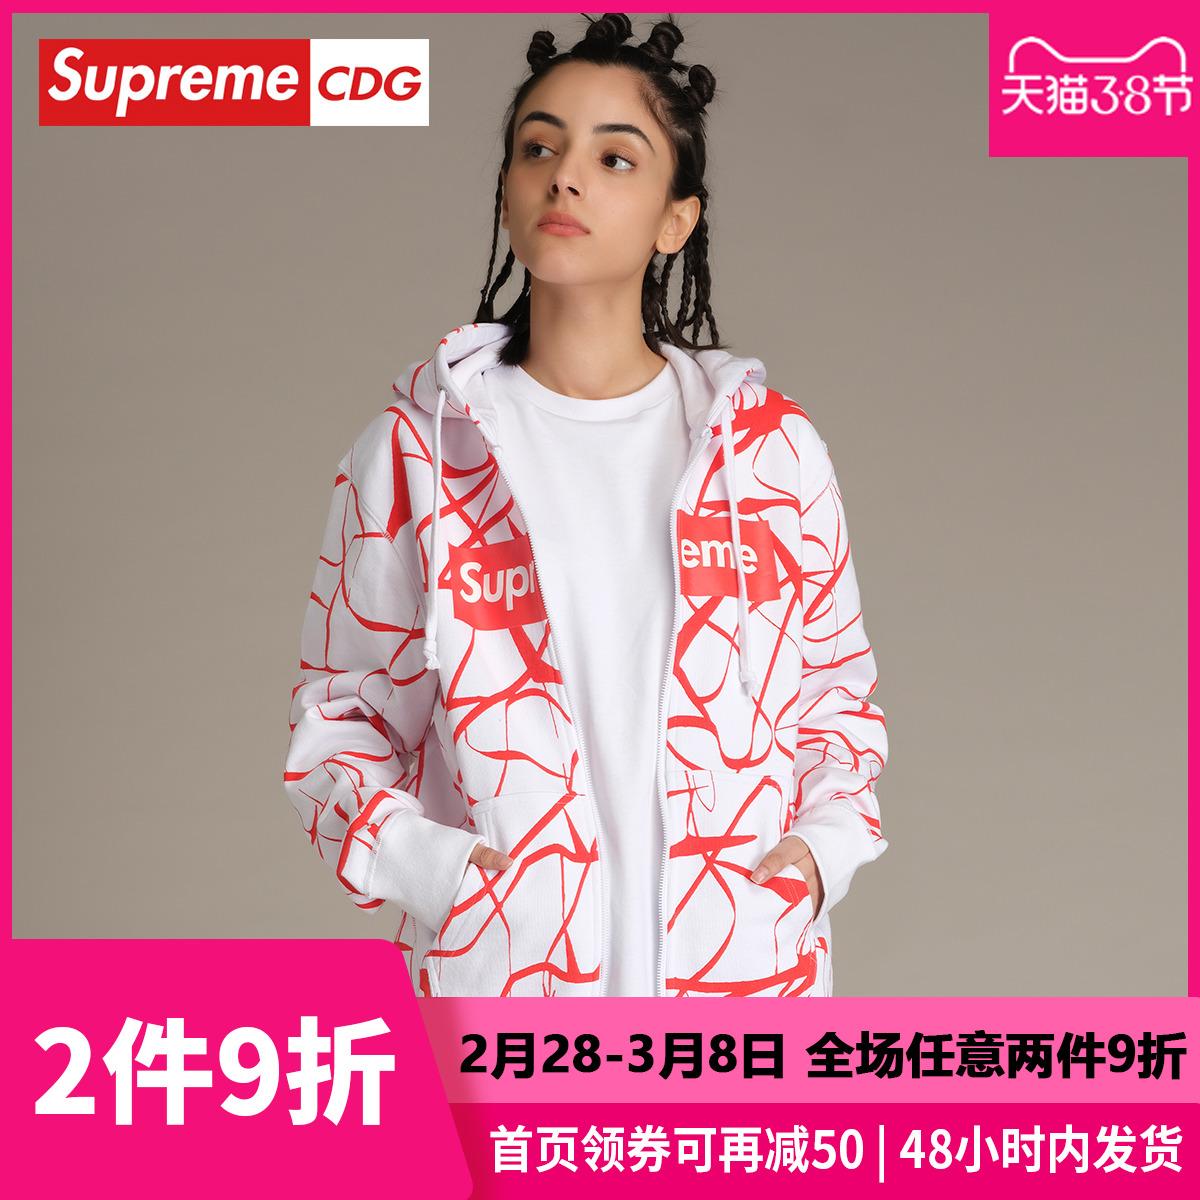 Supreme CDG 2020年春季新款男女同款个性字母印花休闲连帽卫衣